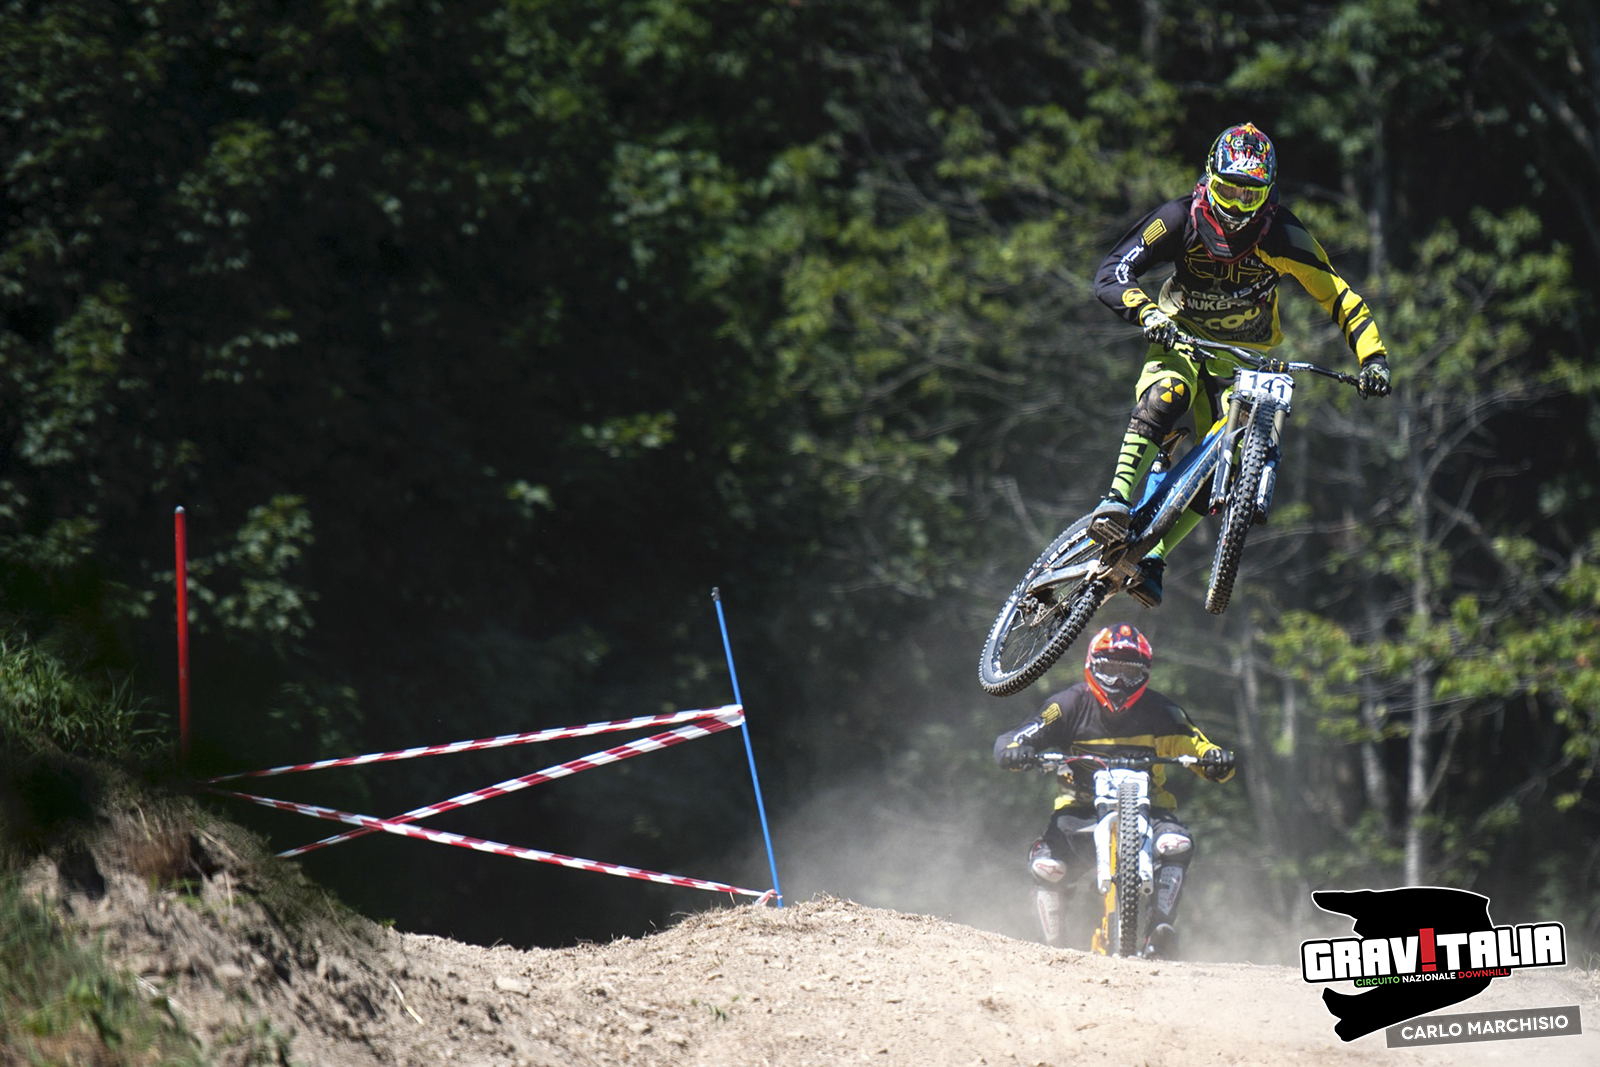 PhotoCarloMarchisio_GIT2015_CampionatiItaliani_Sestola_018